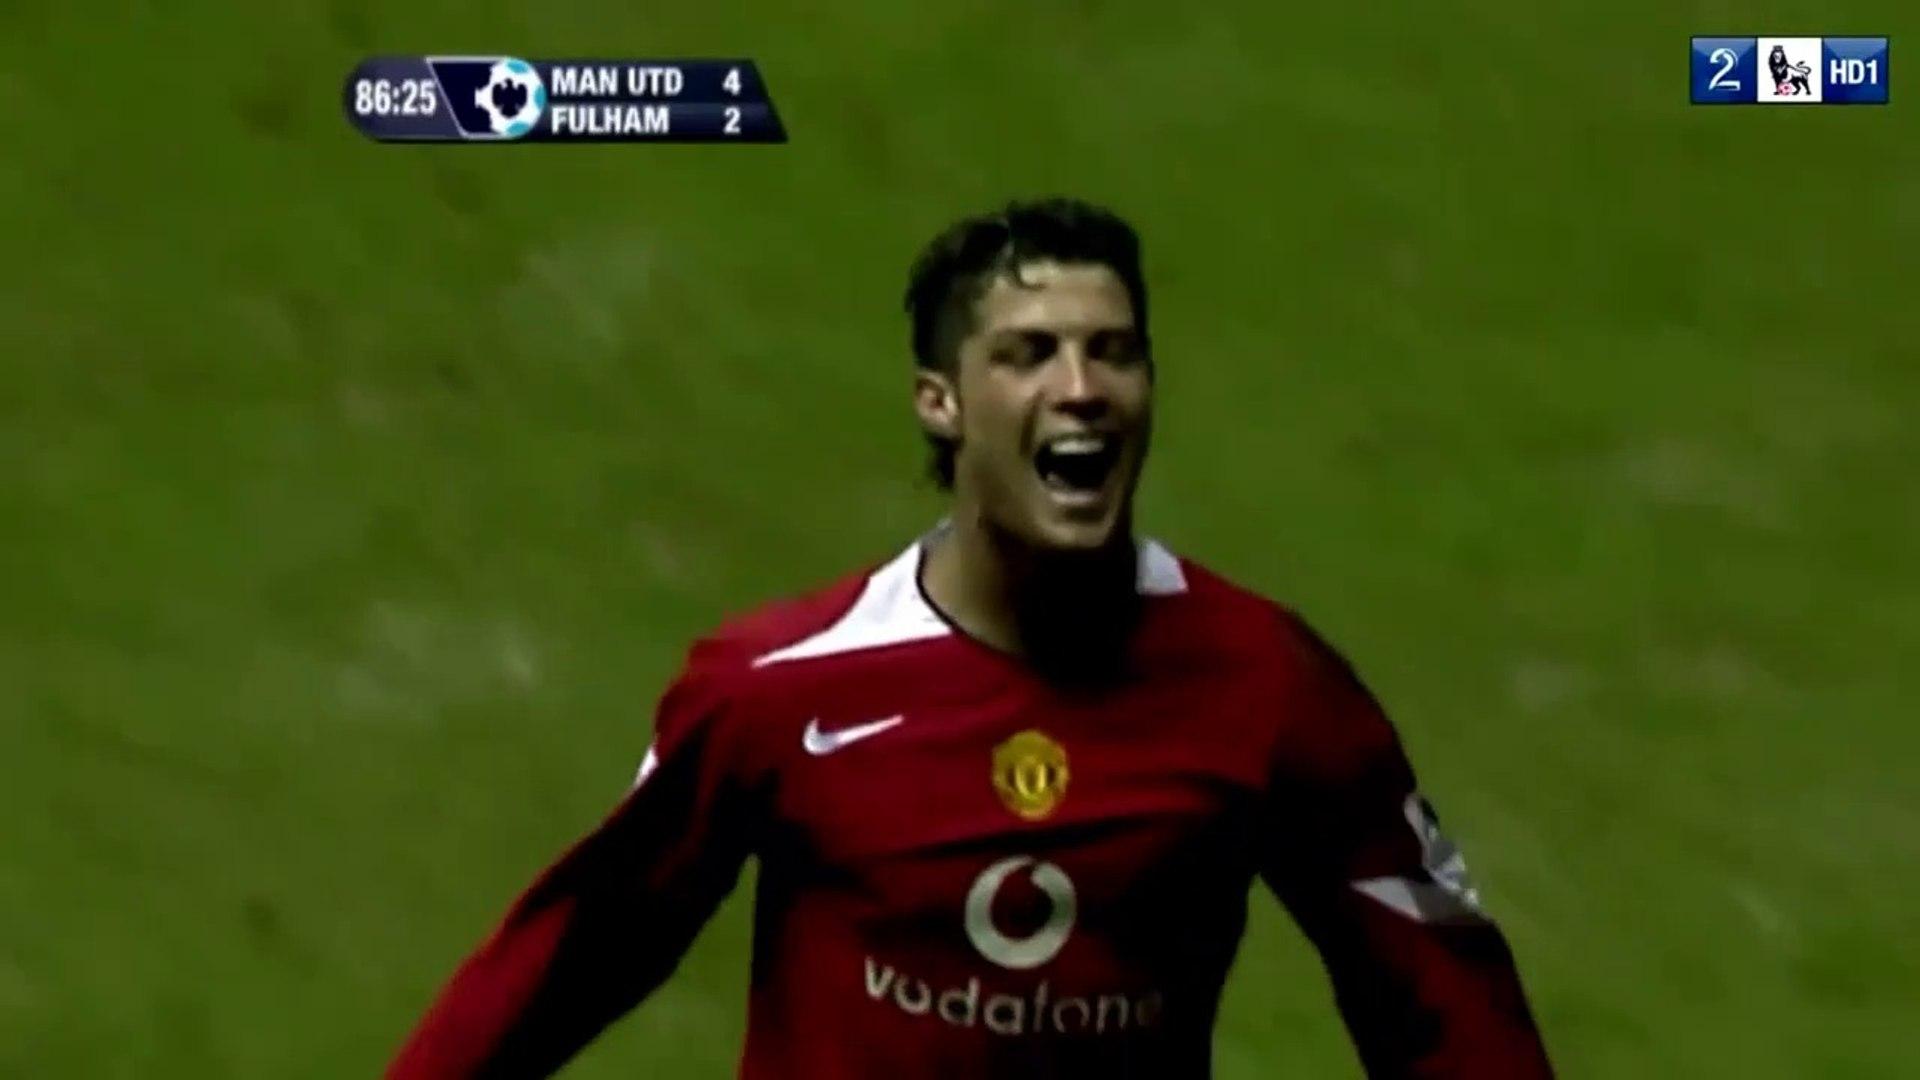 Cristiano Ronaldo ● Goals and Skills ● Manchester United 4:2 Fulham ● Premier League 2005-06